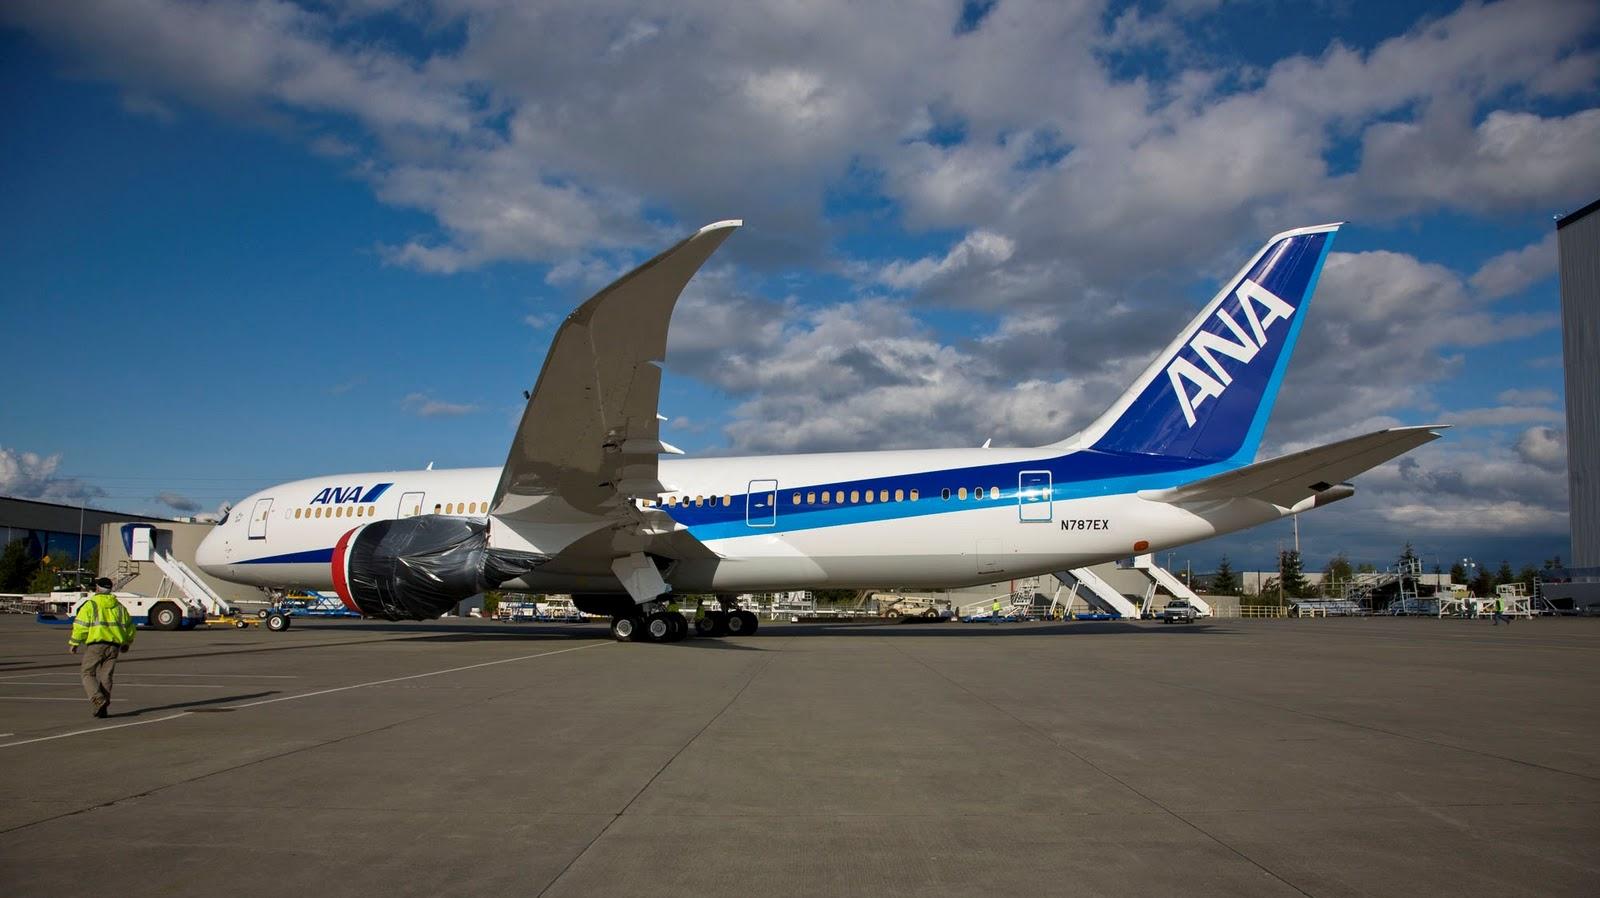 http://3.bp.blogspot.com/_ja676MG45Zg/TJy1O4ZI_8I/AAAAAAAAEmM/QXUSEcgNFZk/s1600/boeing-787-dreamliner-ana-airlines-japan.jpg